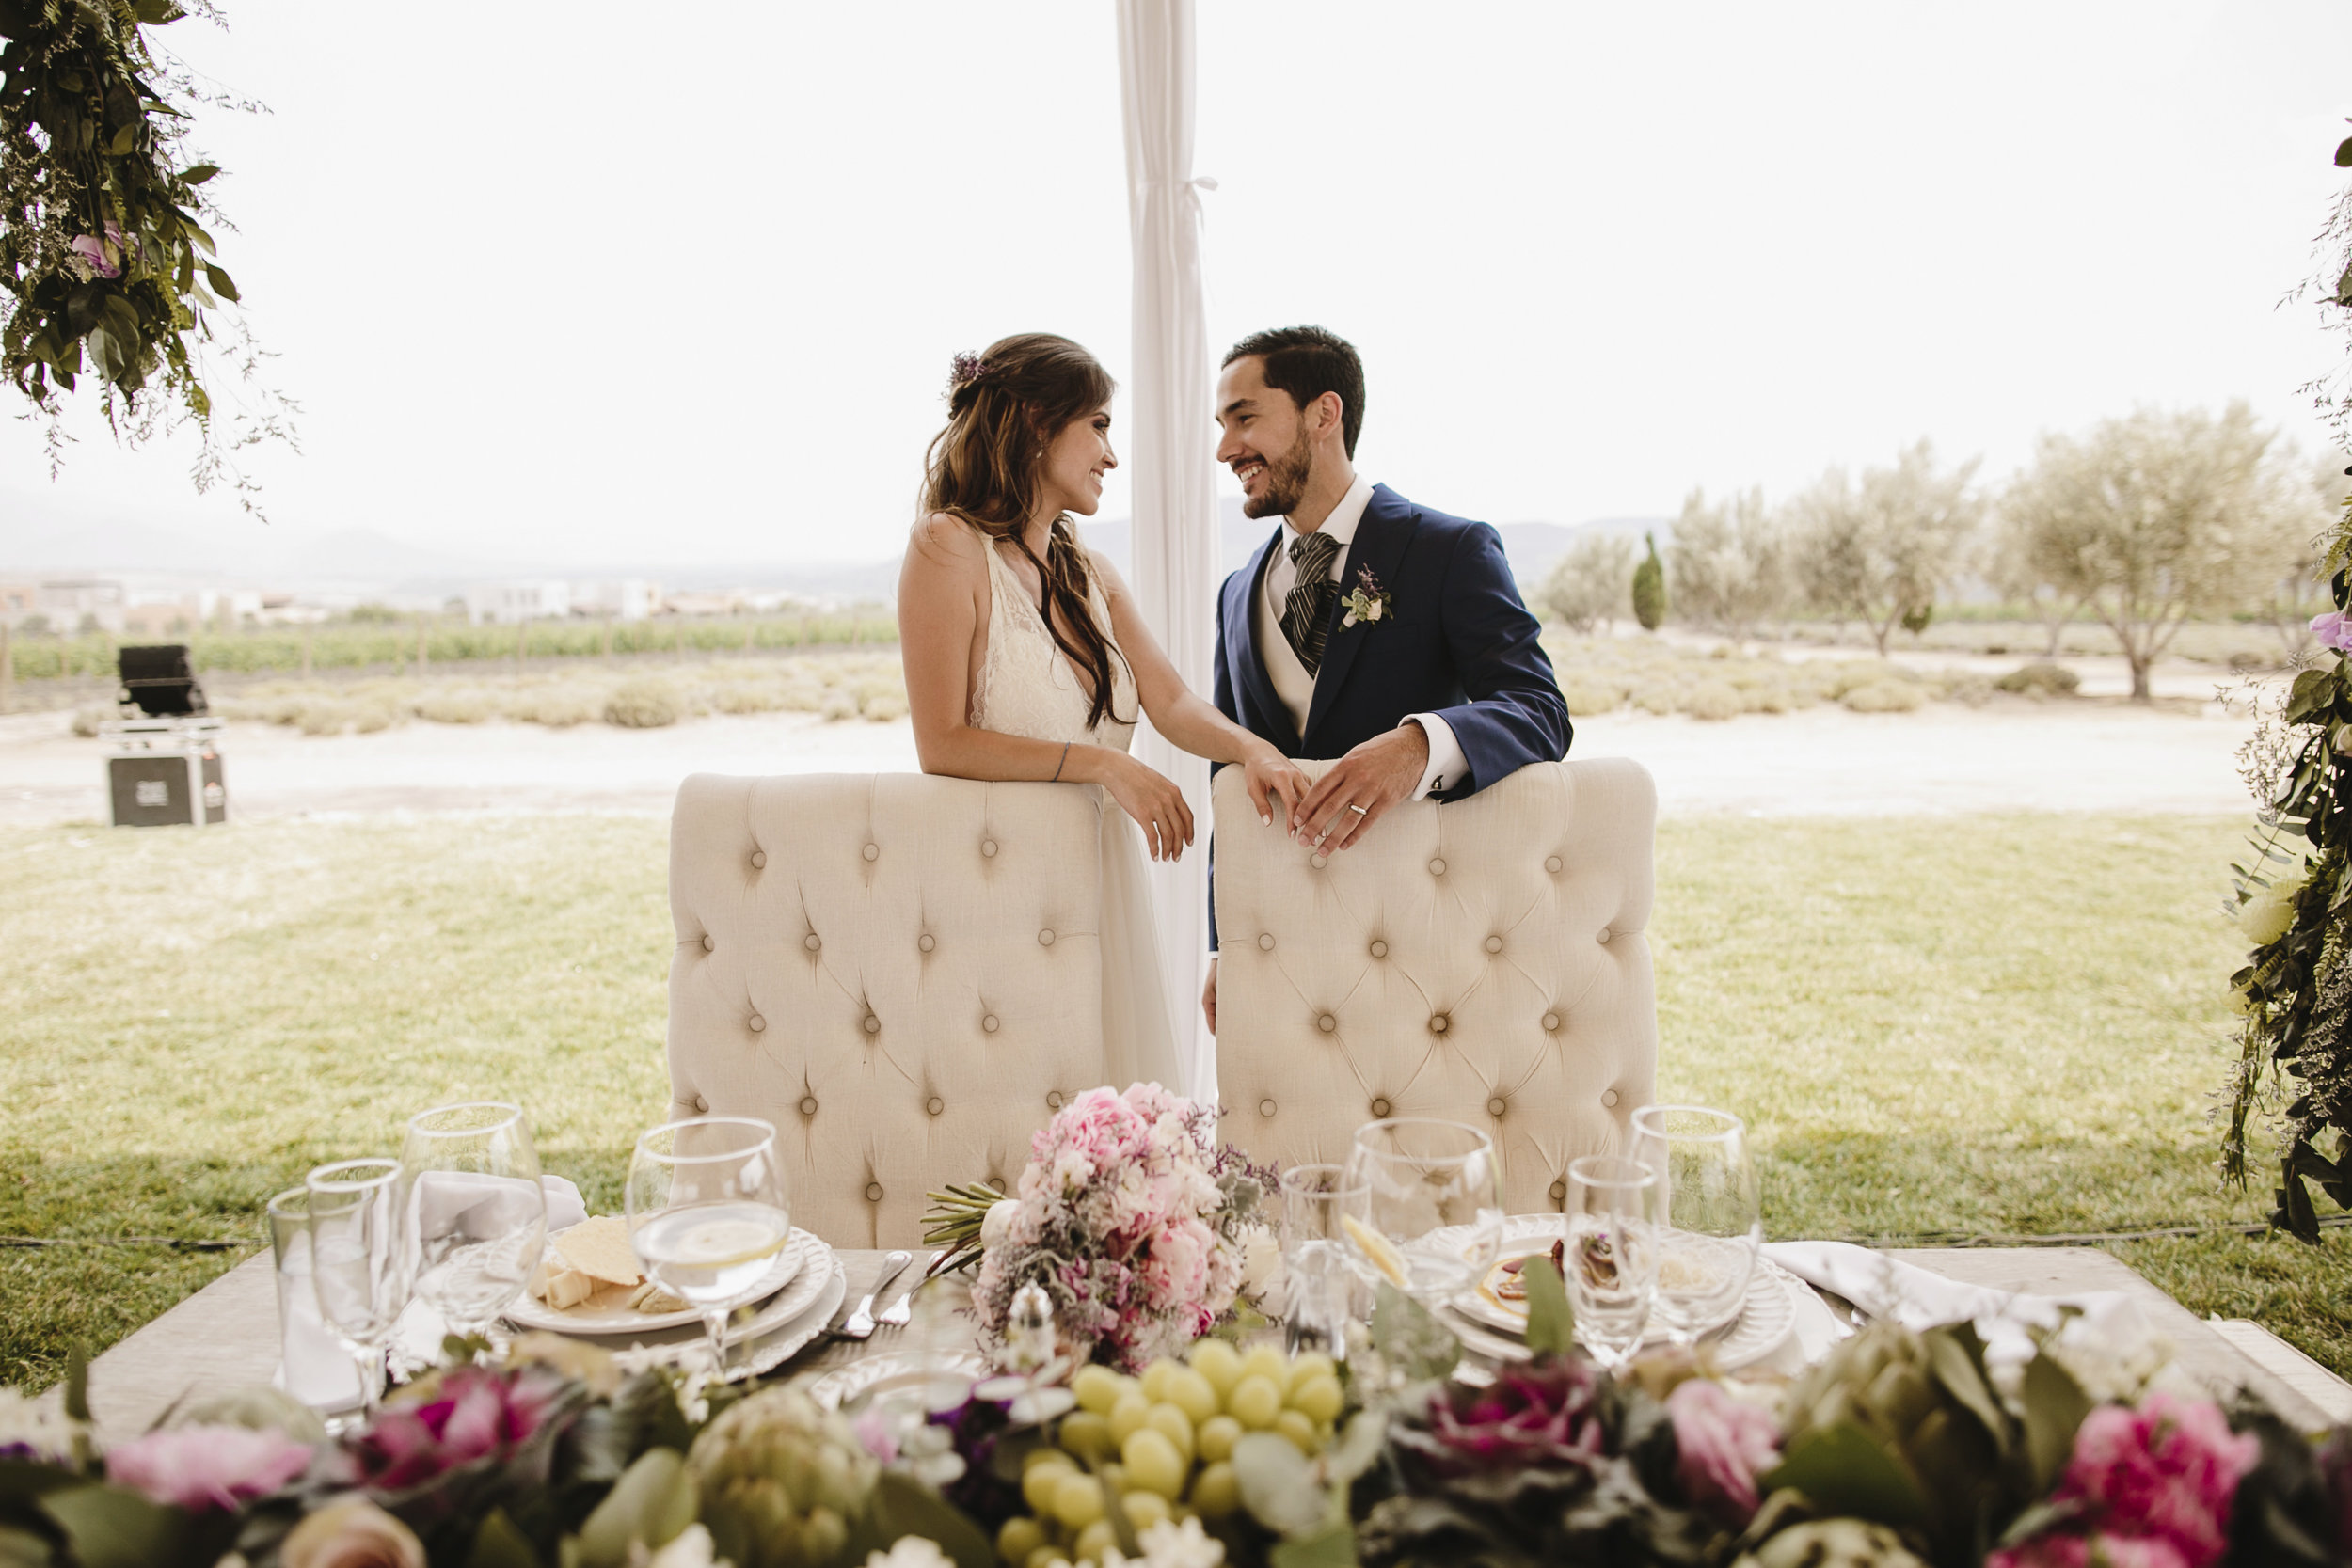 alfons_flores_destination_wedding_photography_mavi_david-1392.JPG